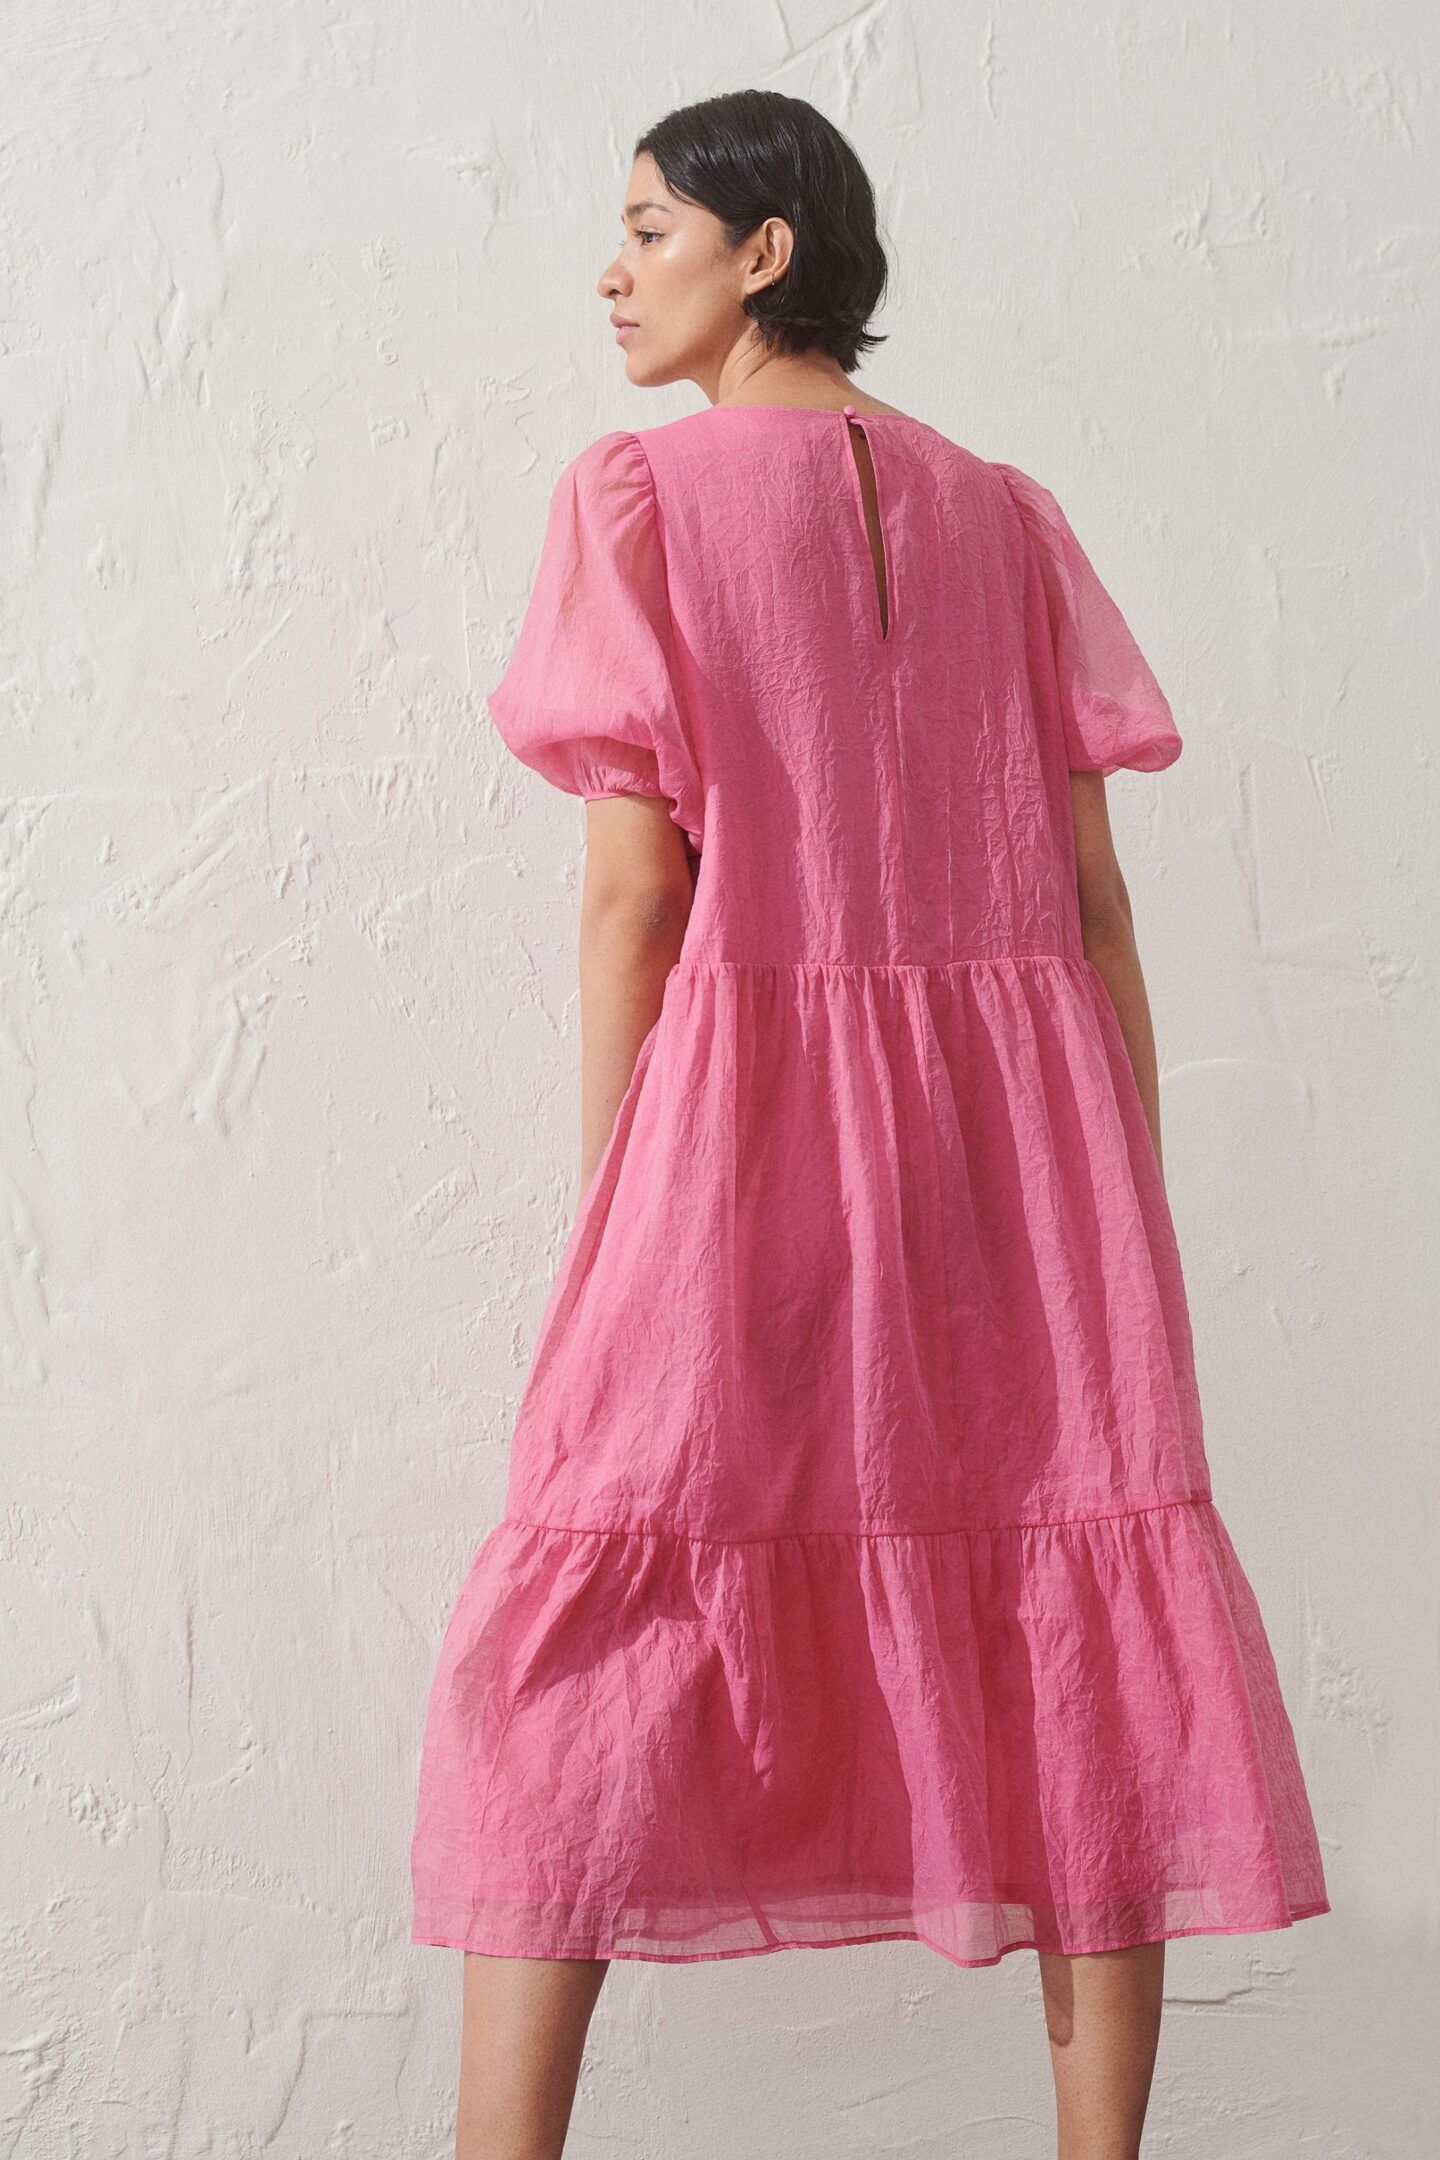 Flowy Dress for Spring